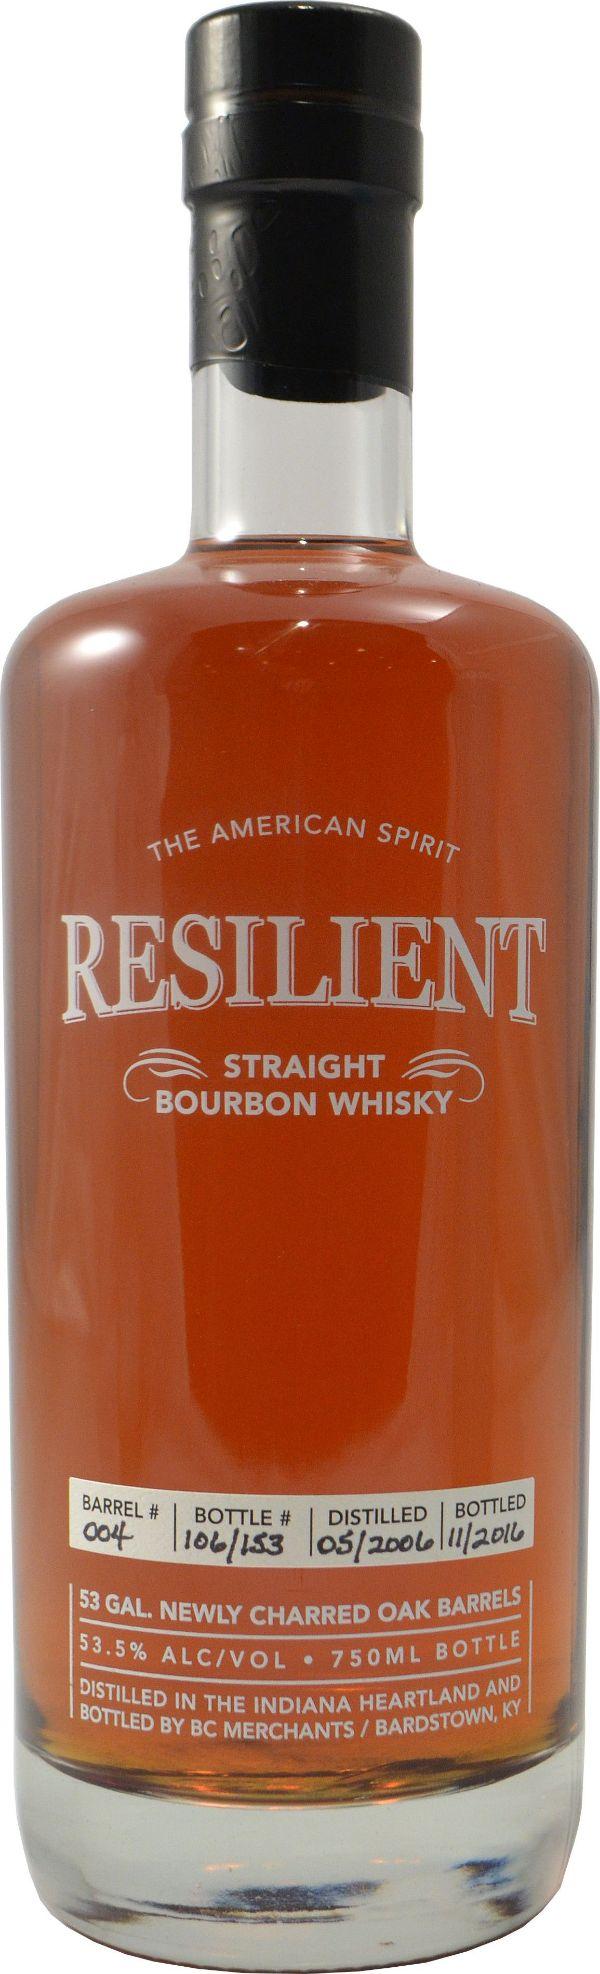 Resilient 14 Yr Straight Bourbon